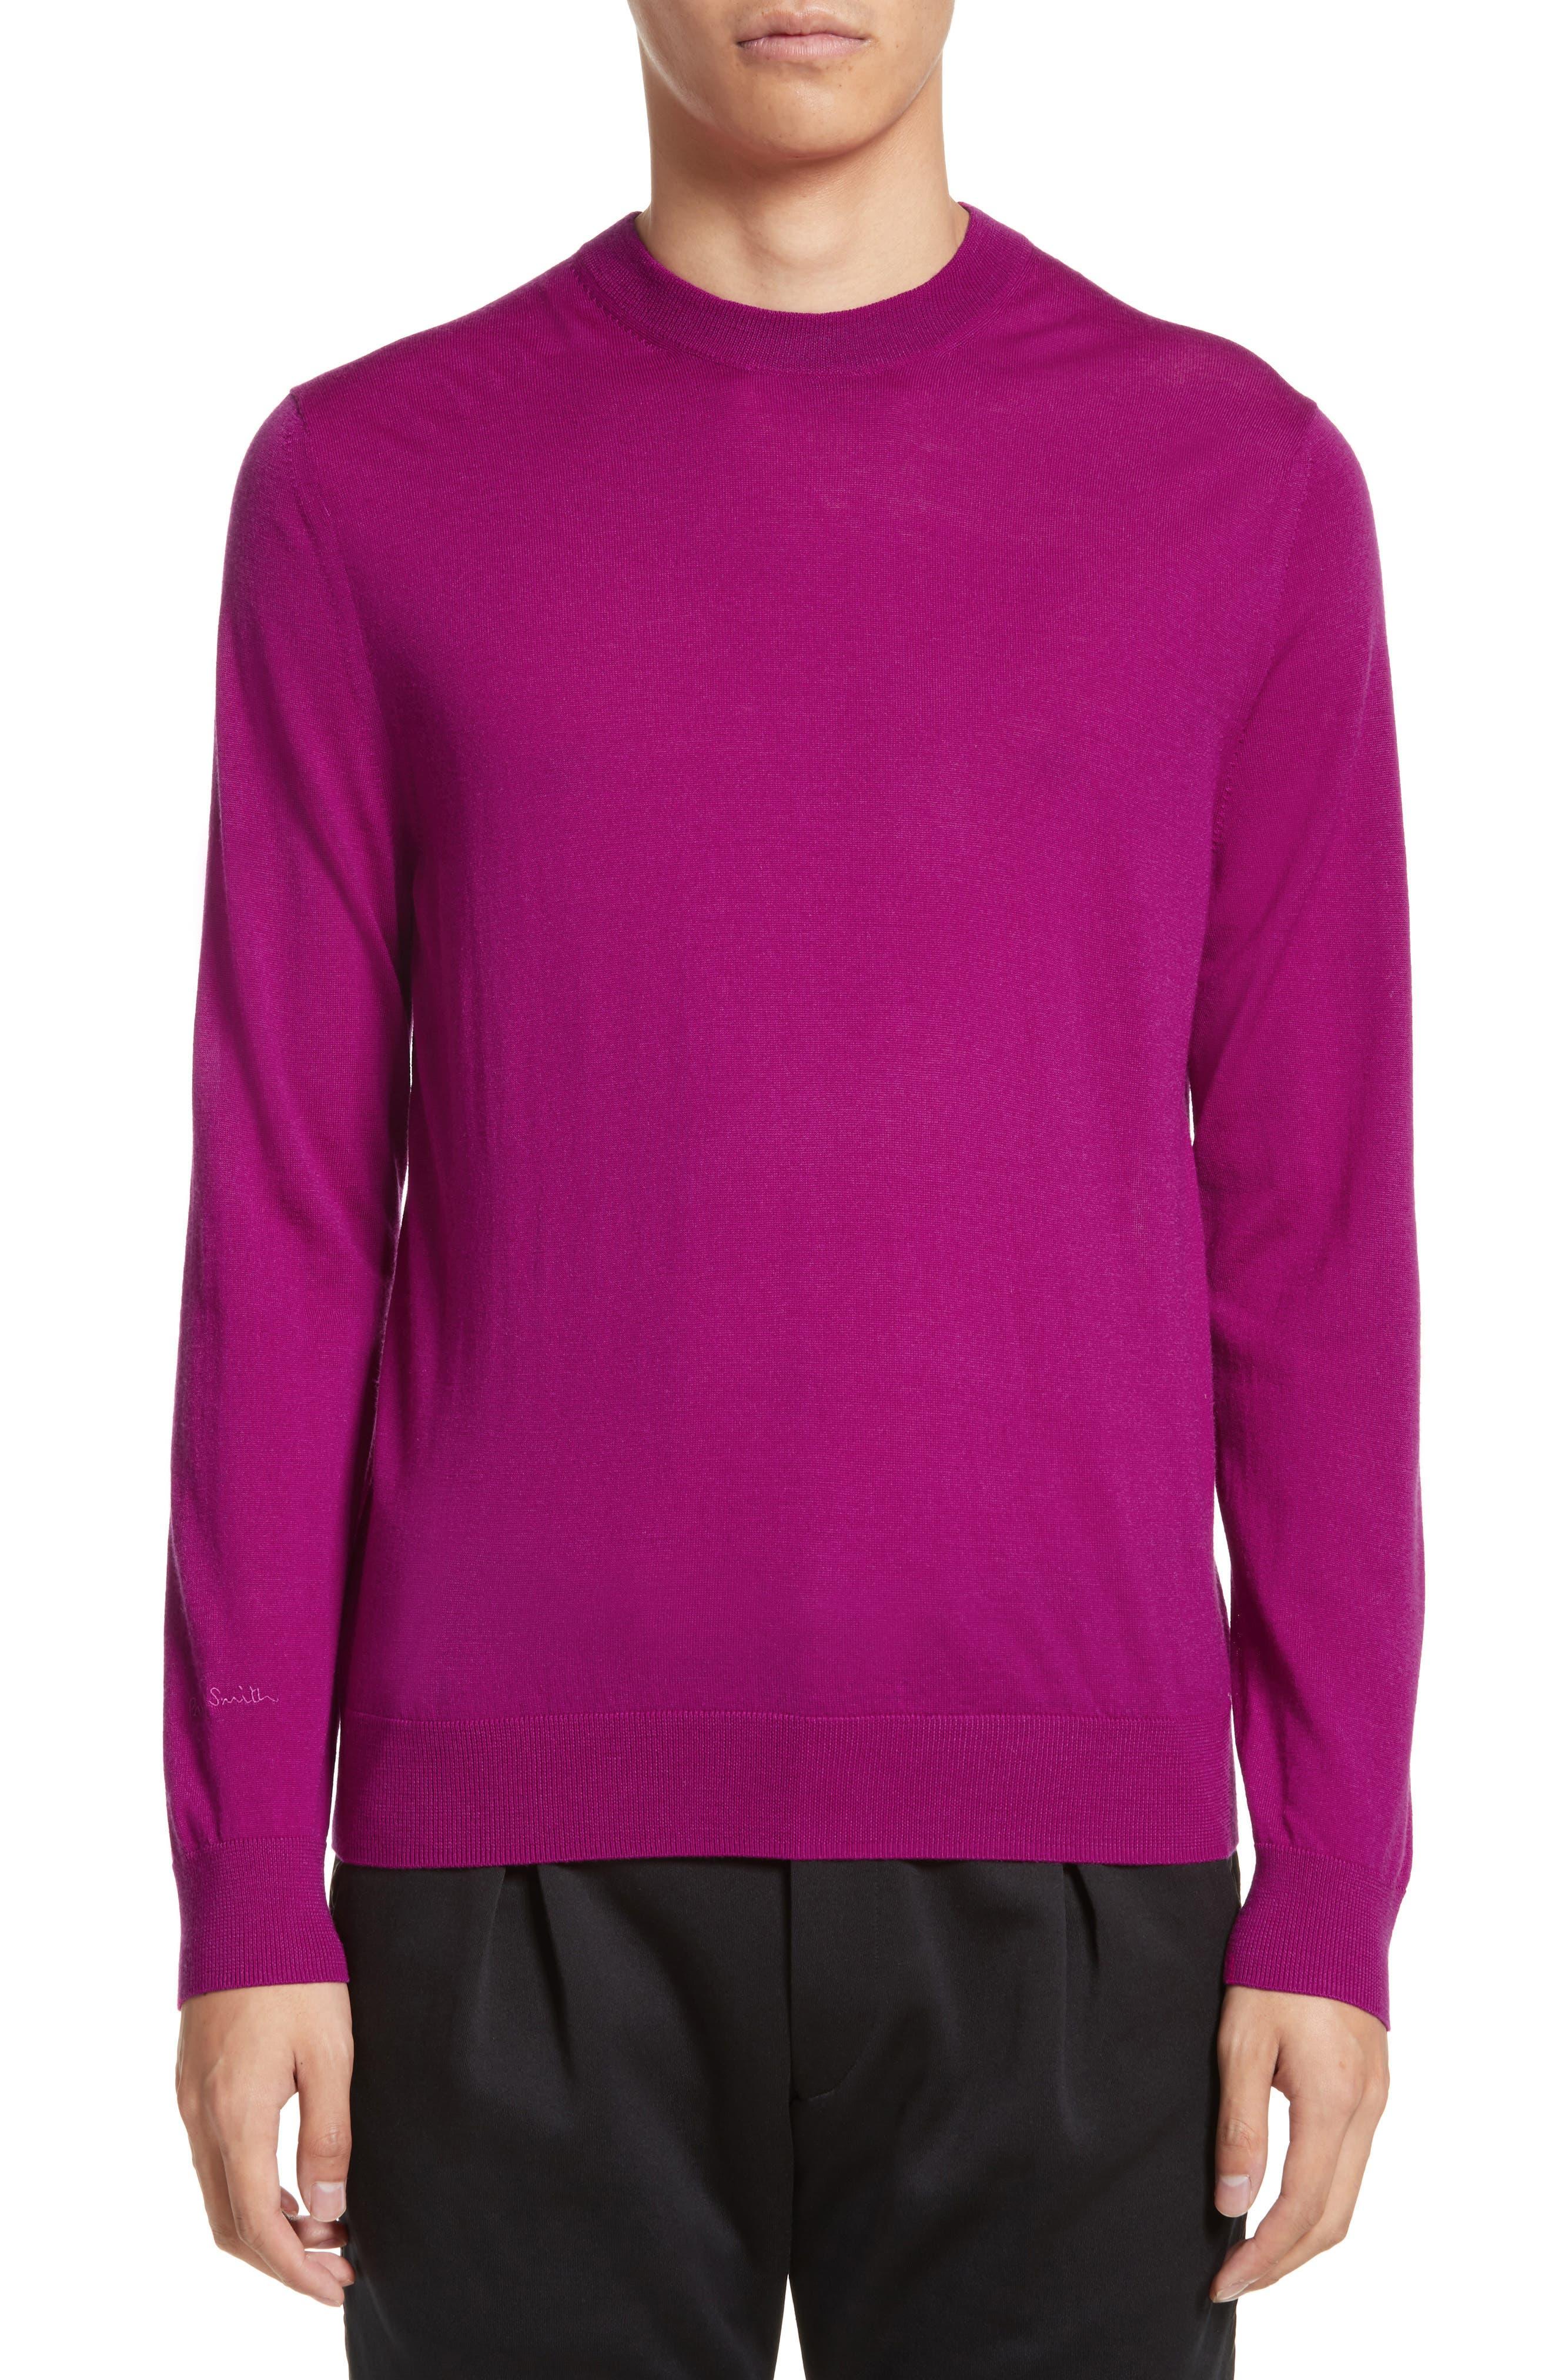 Alternate Image 1 Selected - Paul Smith Merino Wool Crewneck Sweater